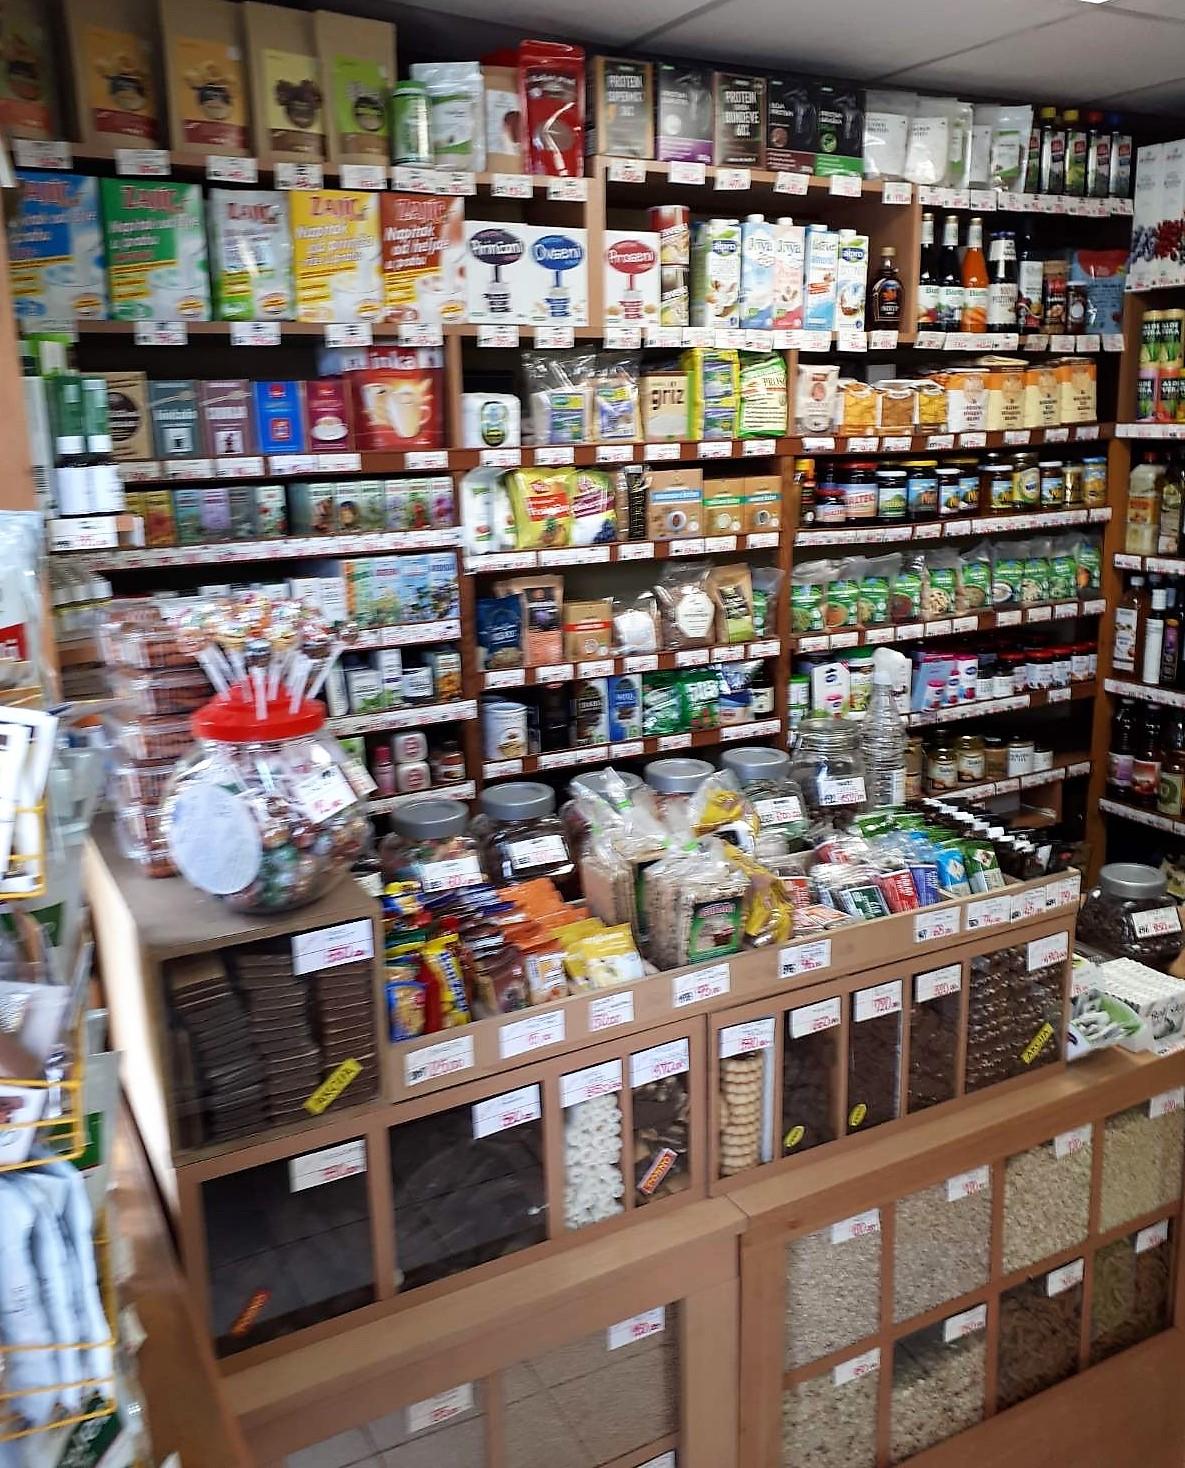 prodavnica_zdrave_hrane_libra_unutra